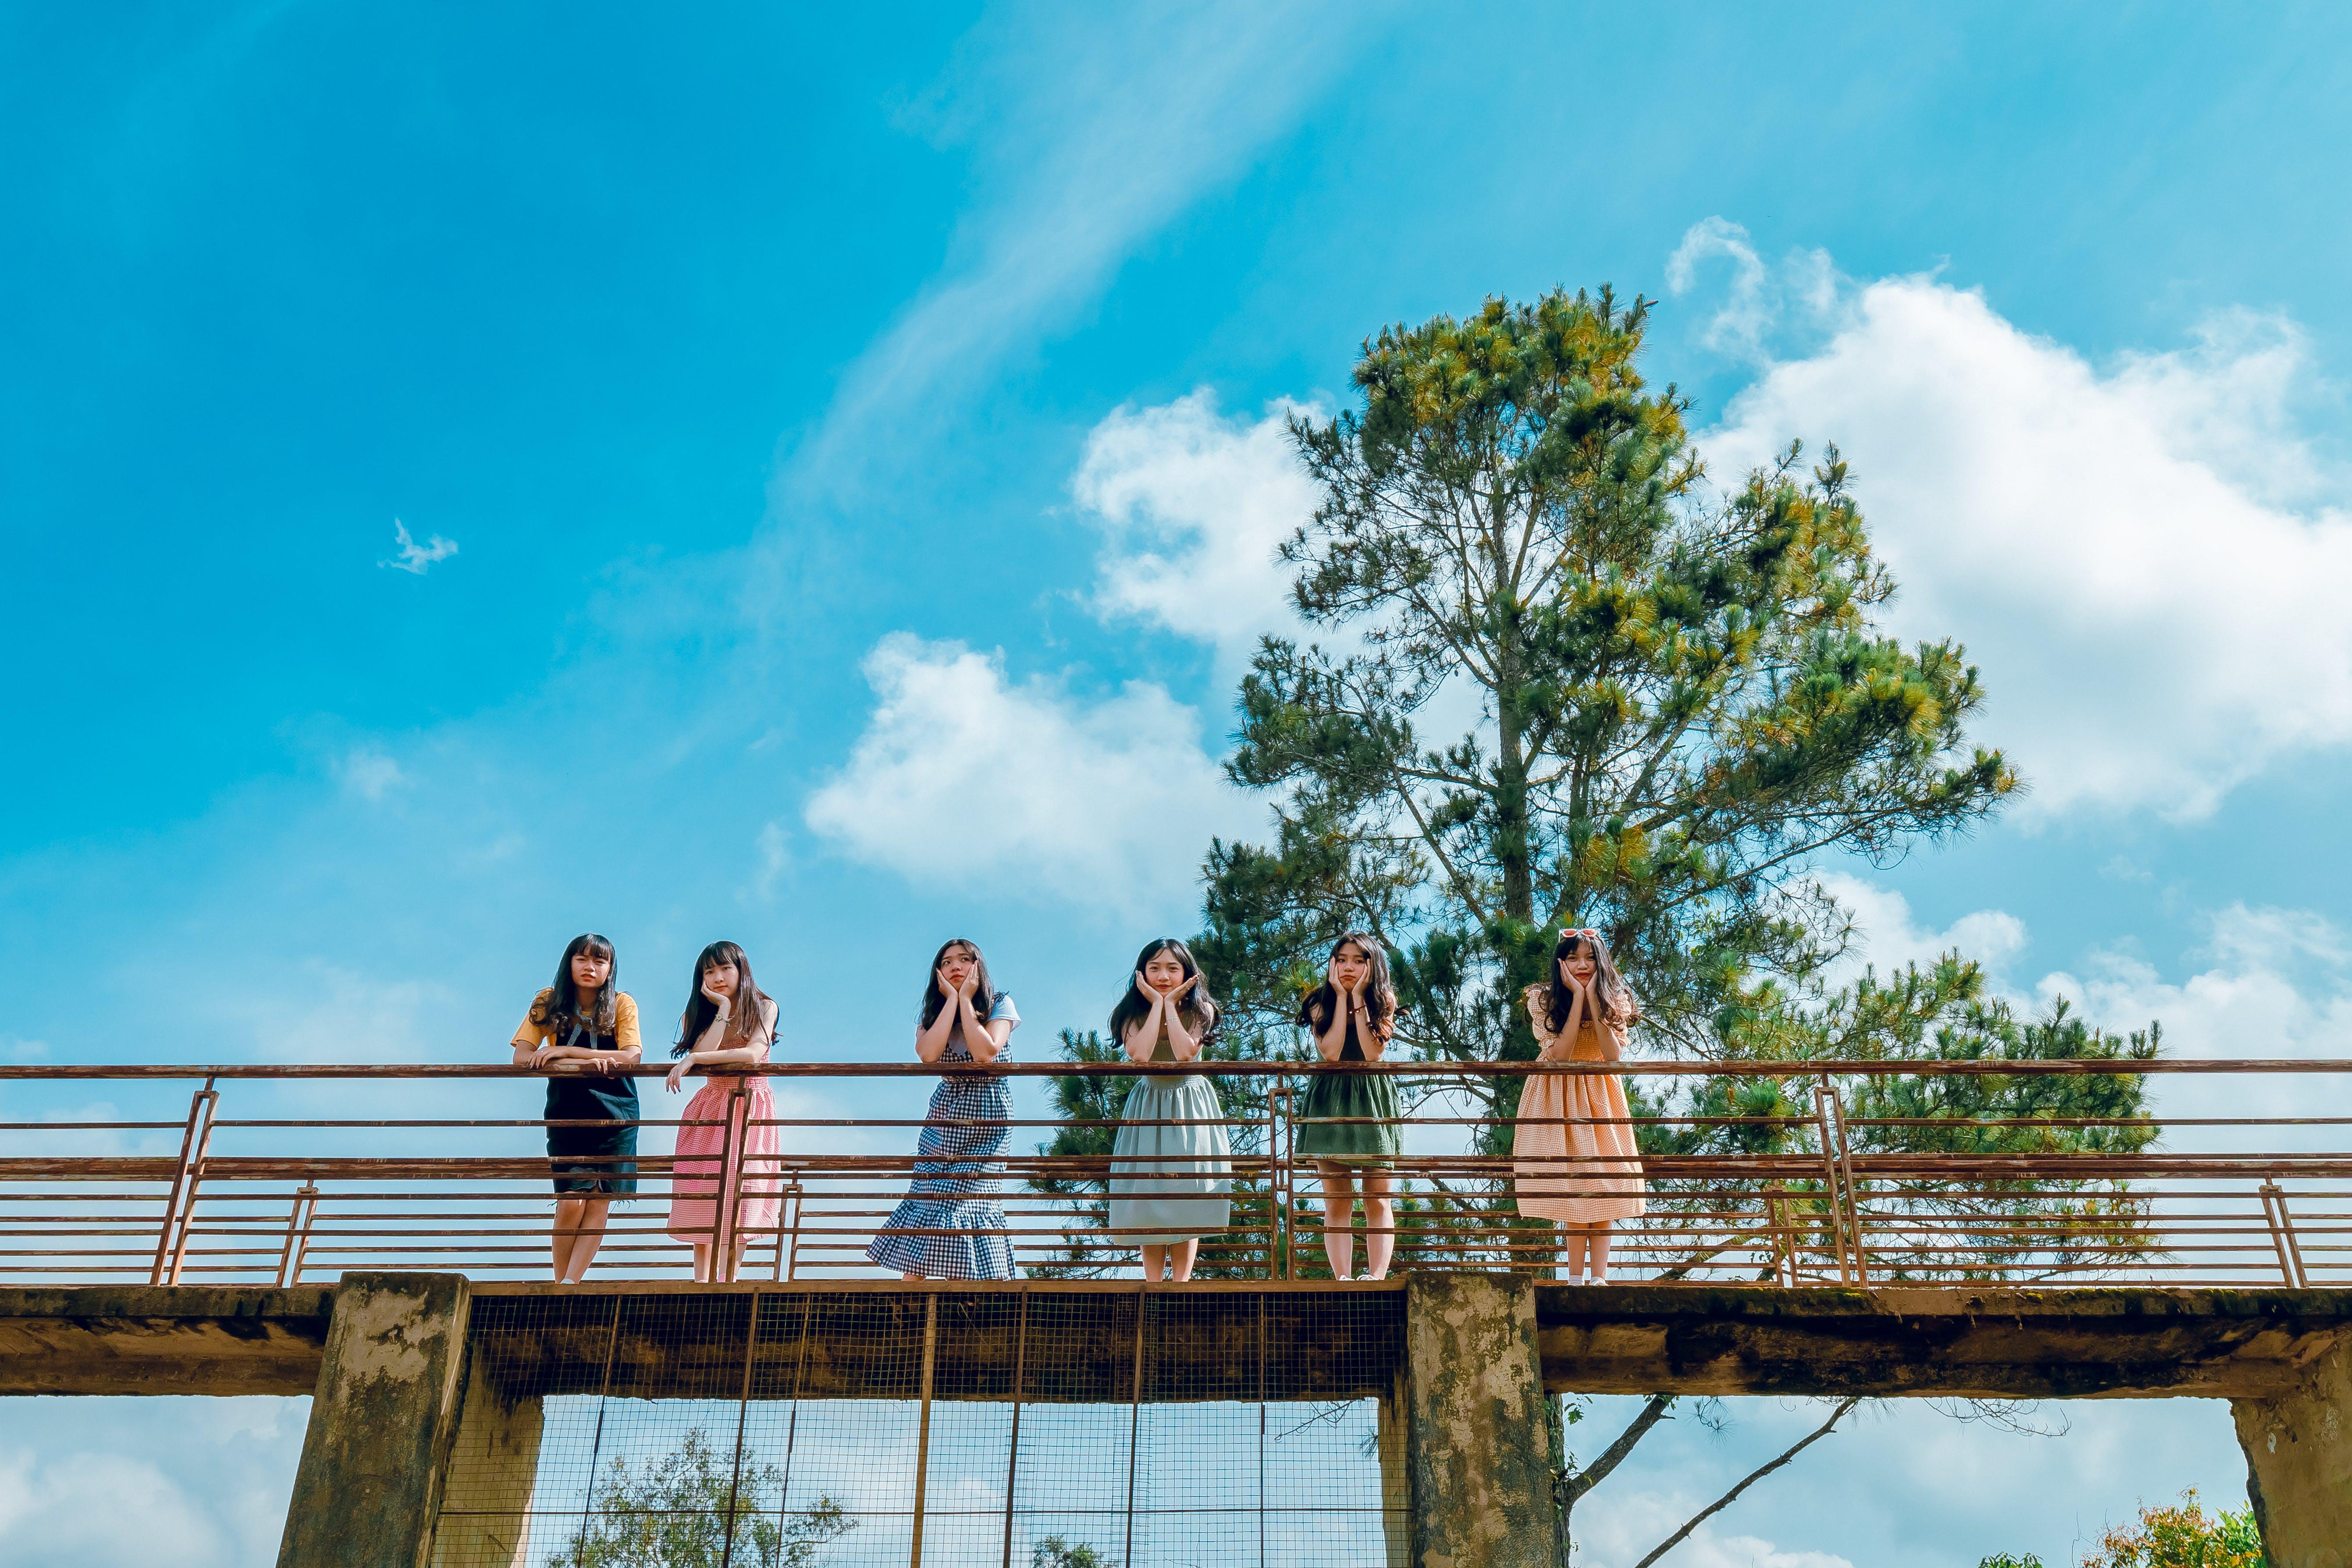 Six Women on Bridge